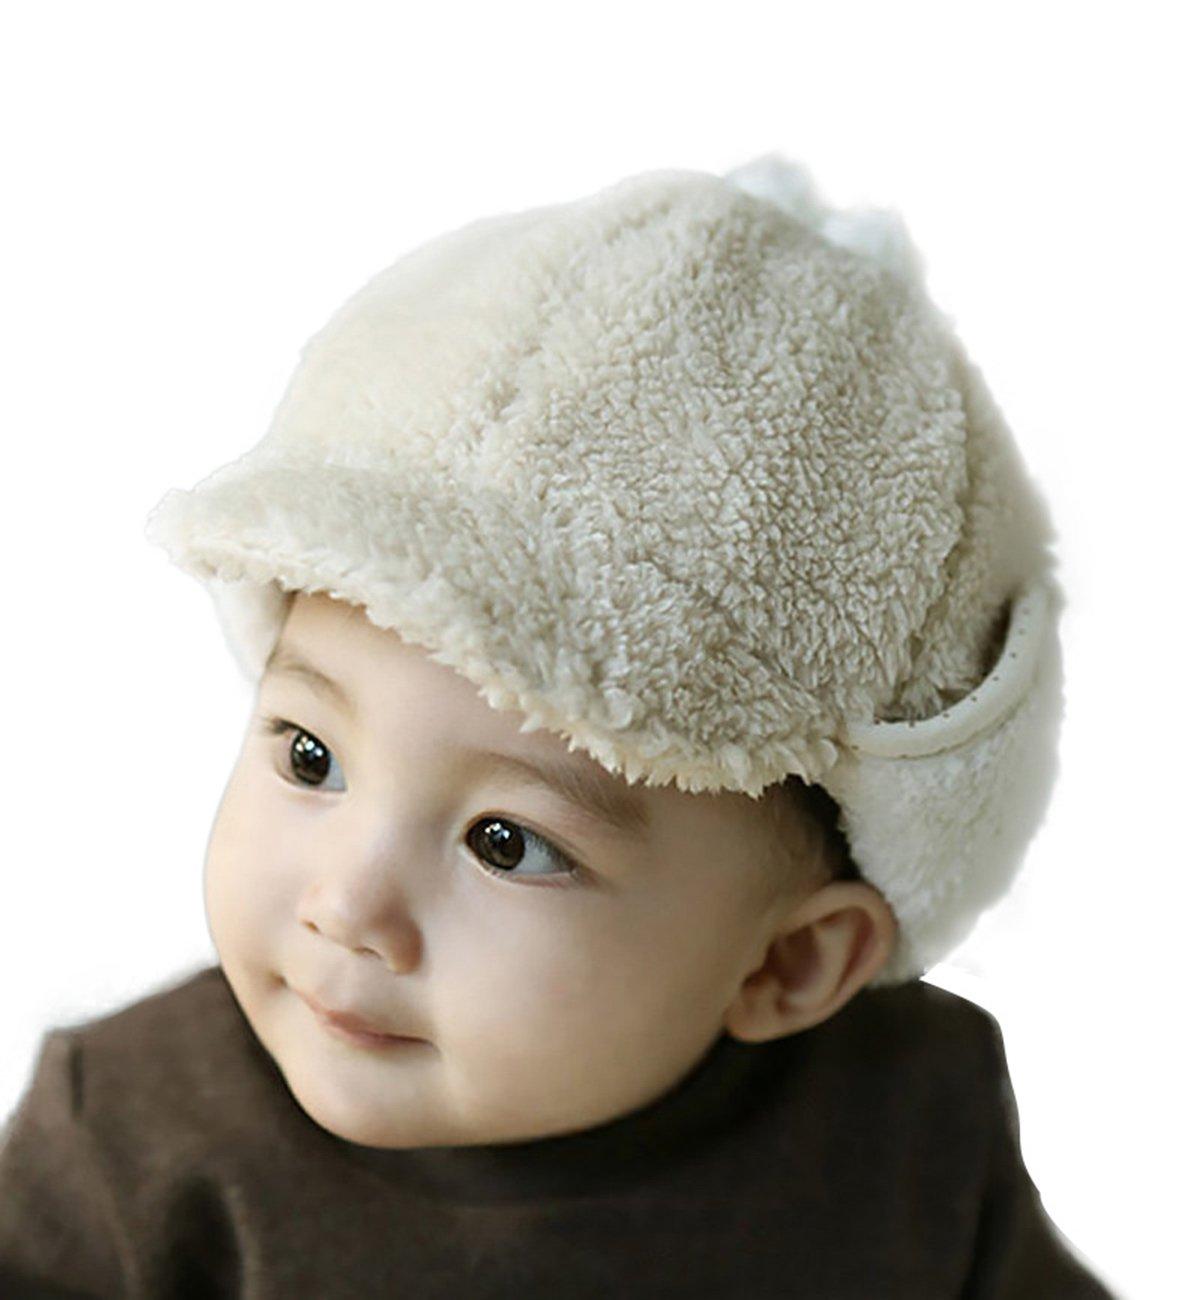 SUMOLUX Baby Infant Toddler Boys Winter Earmuffs Peaked Cap Warm Plush Soft Beanie Hat